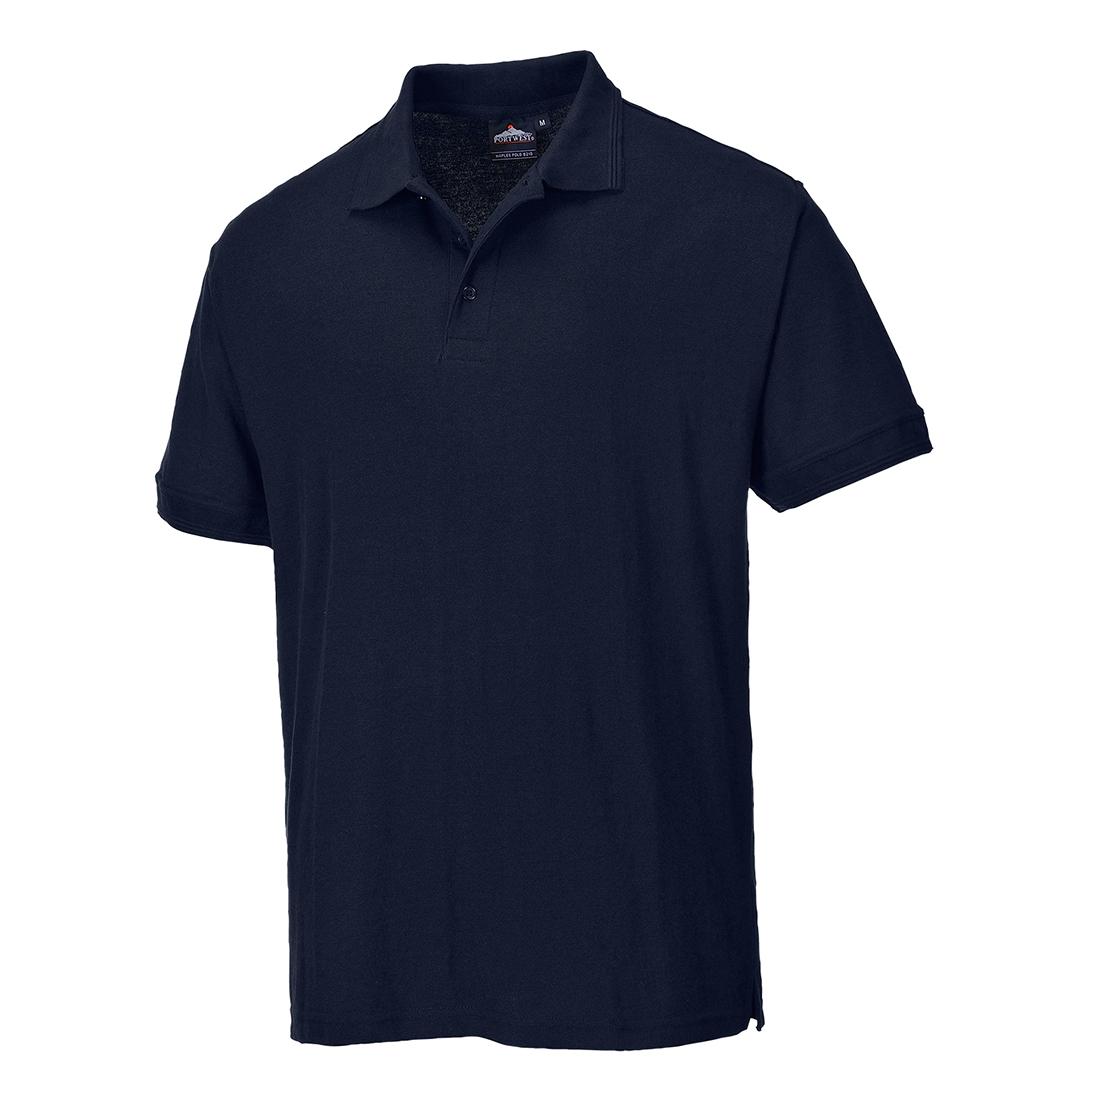 Naples Polo Shirt Dark Navy XXLR